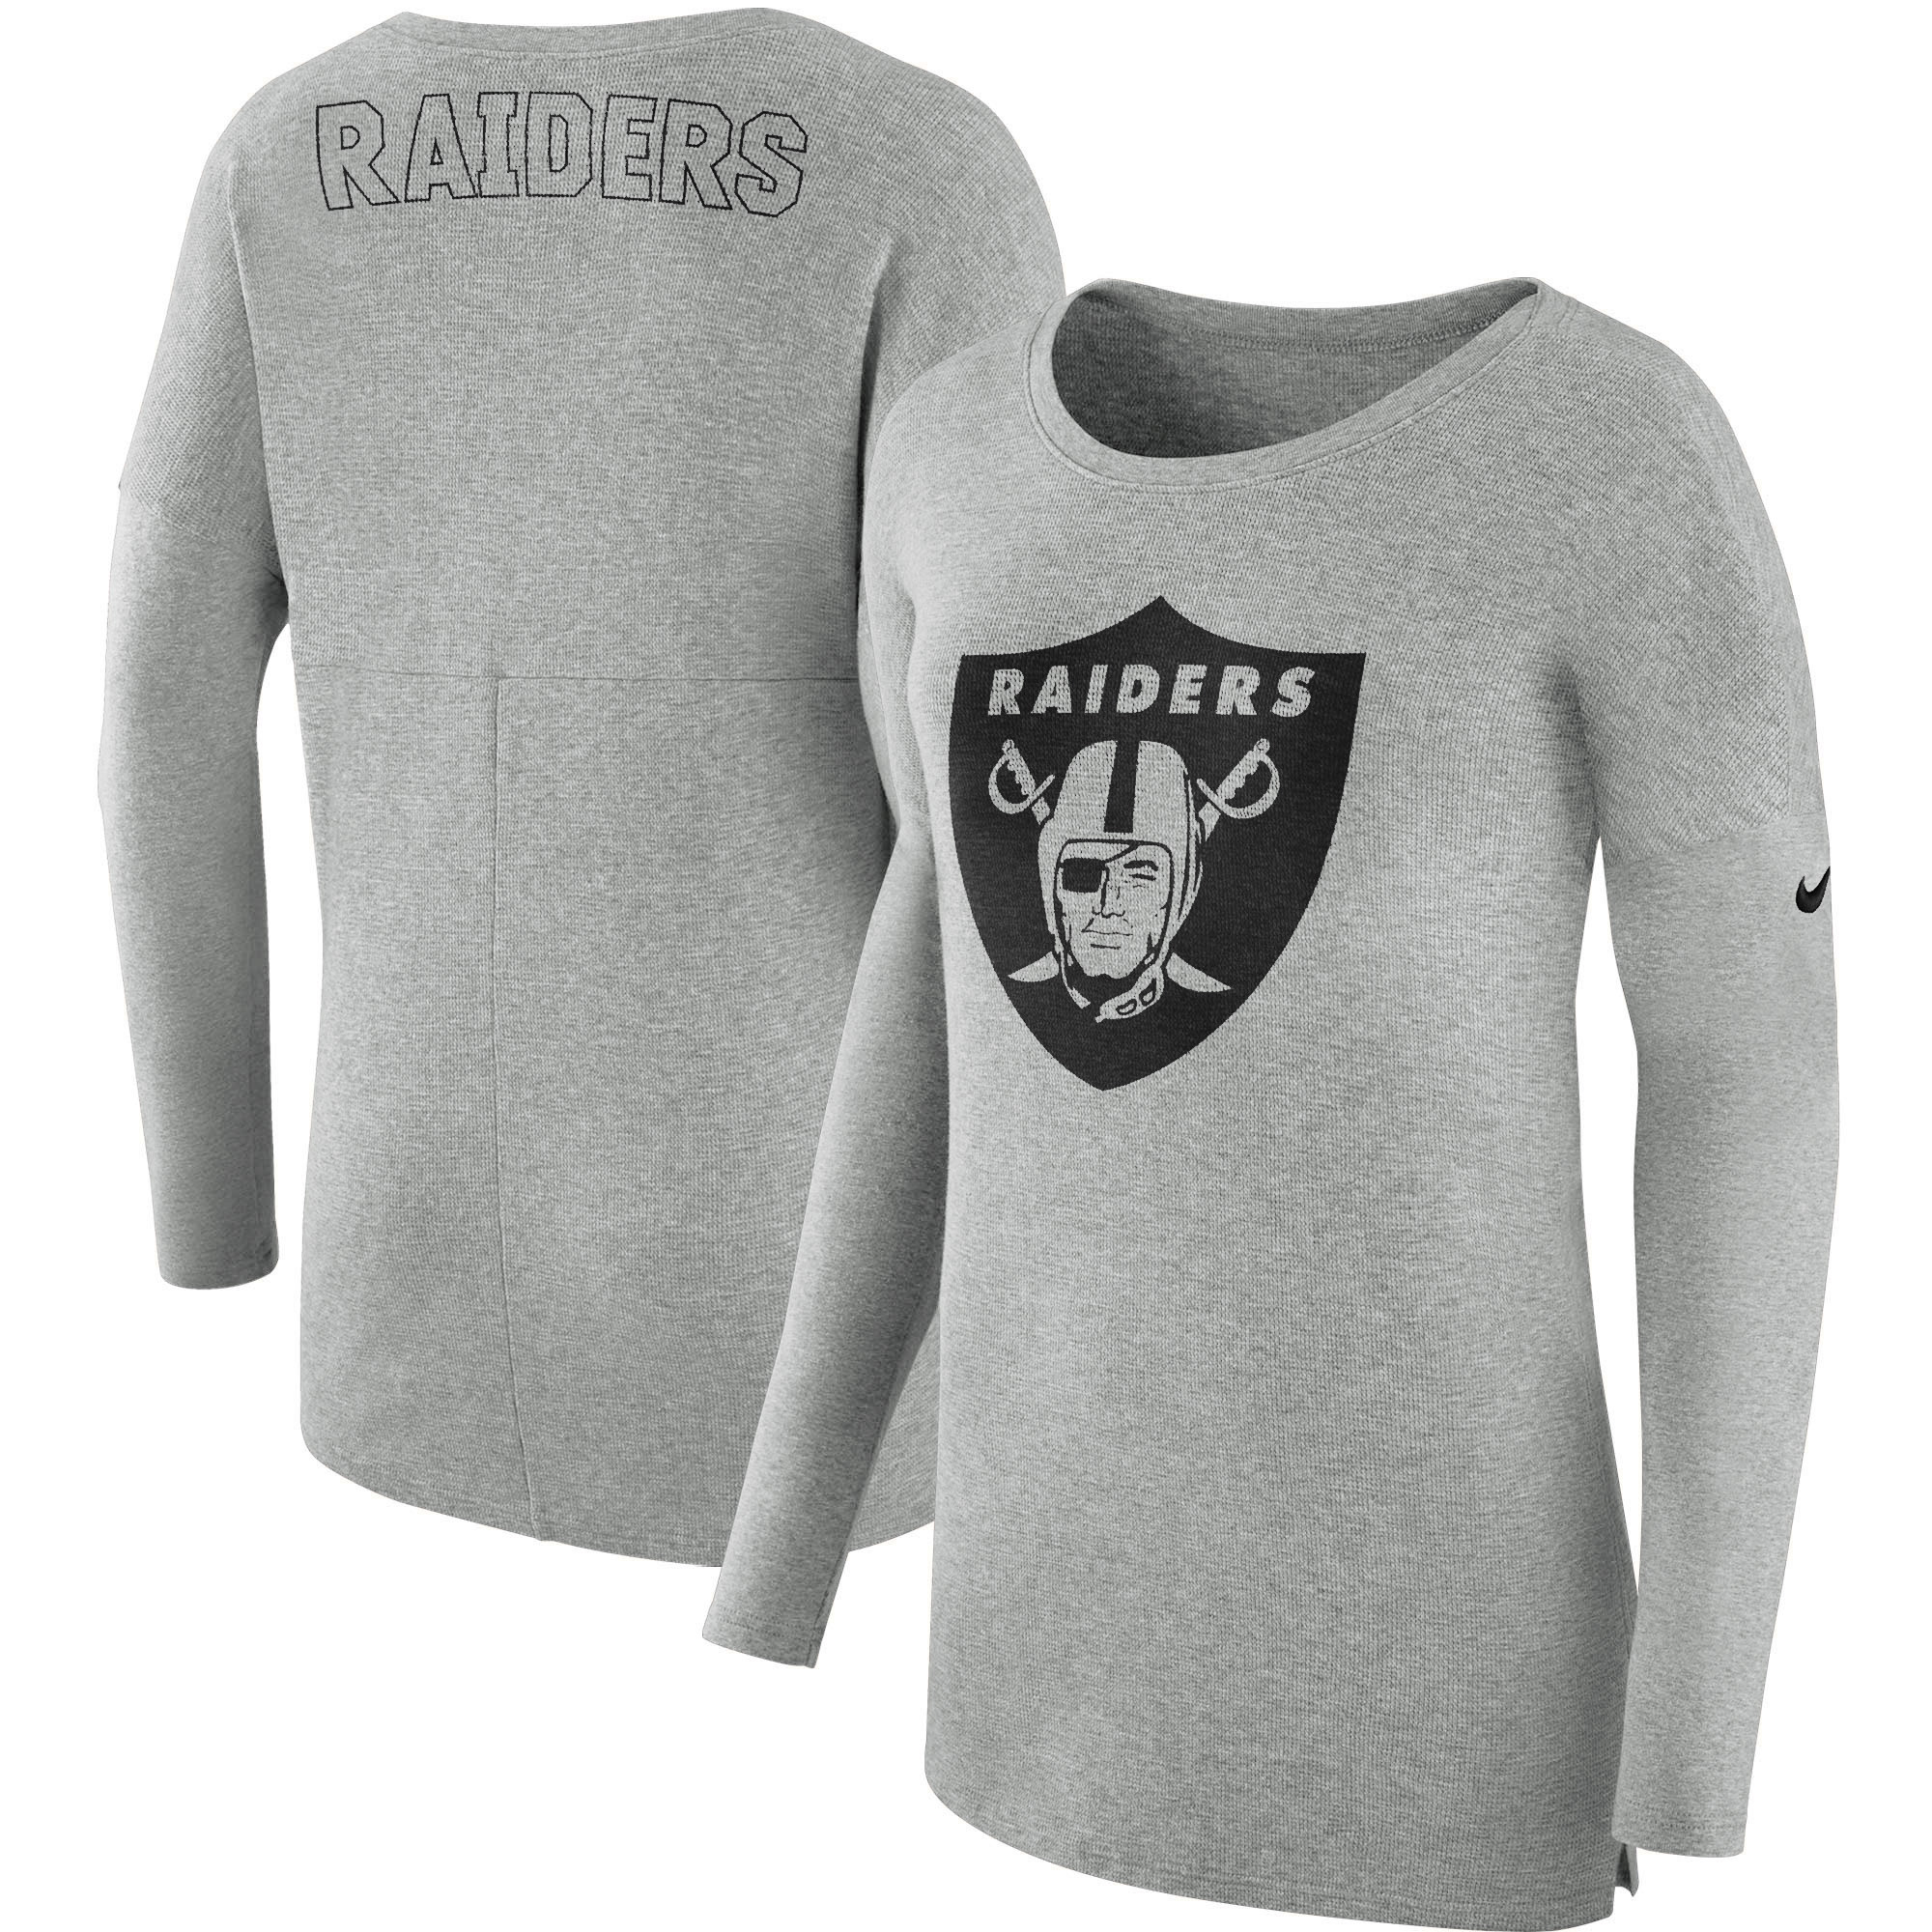 a9d4c05de3a Oakland Raiders Nike Women s Cozy French Terry Crew Sweatshirt - Heathered  Gray - Walmart.com